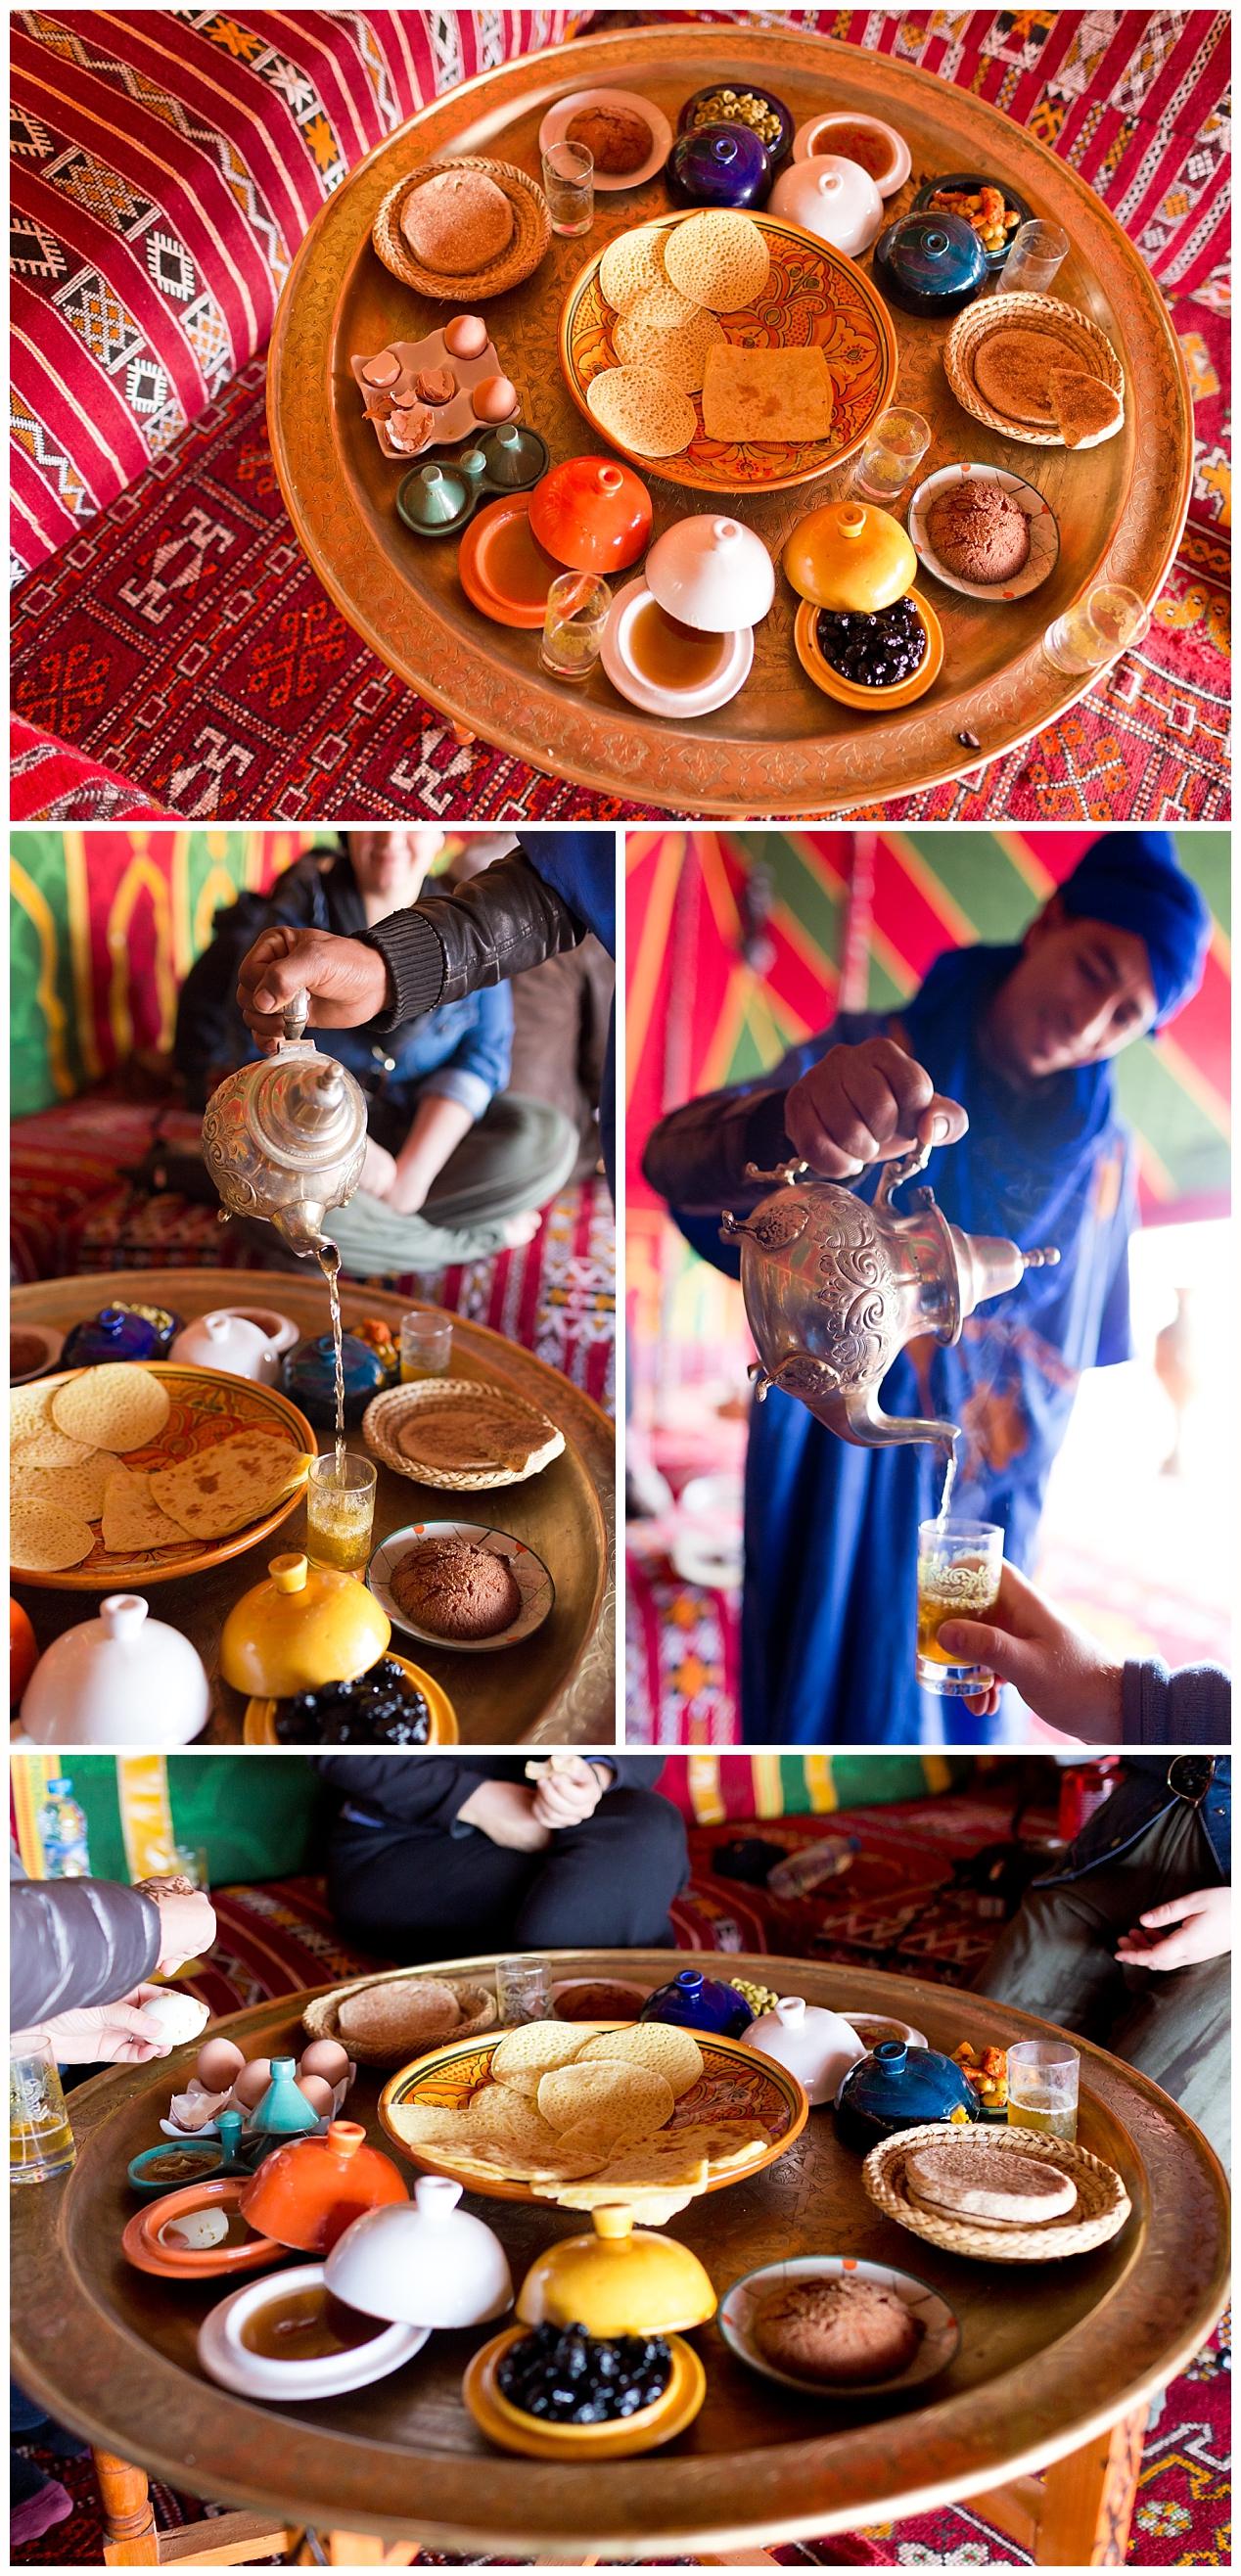 traditional Berber breakfast in Morocco